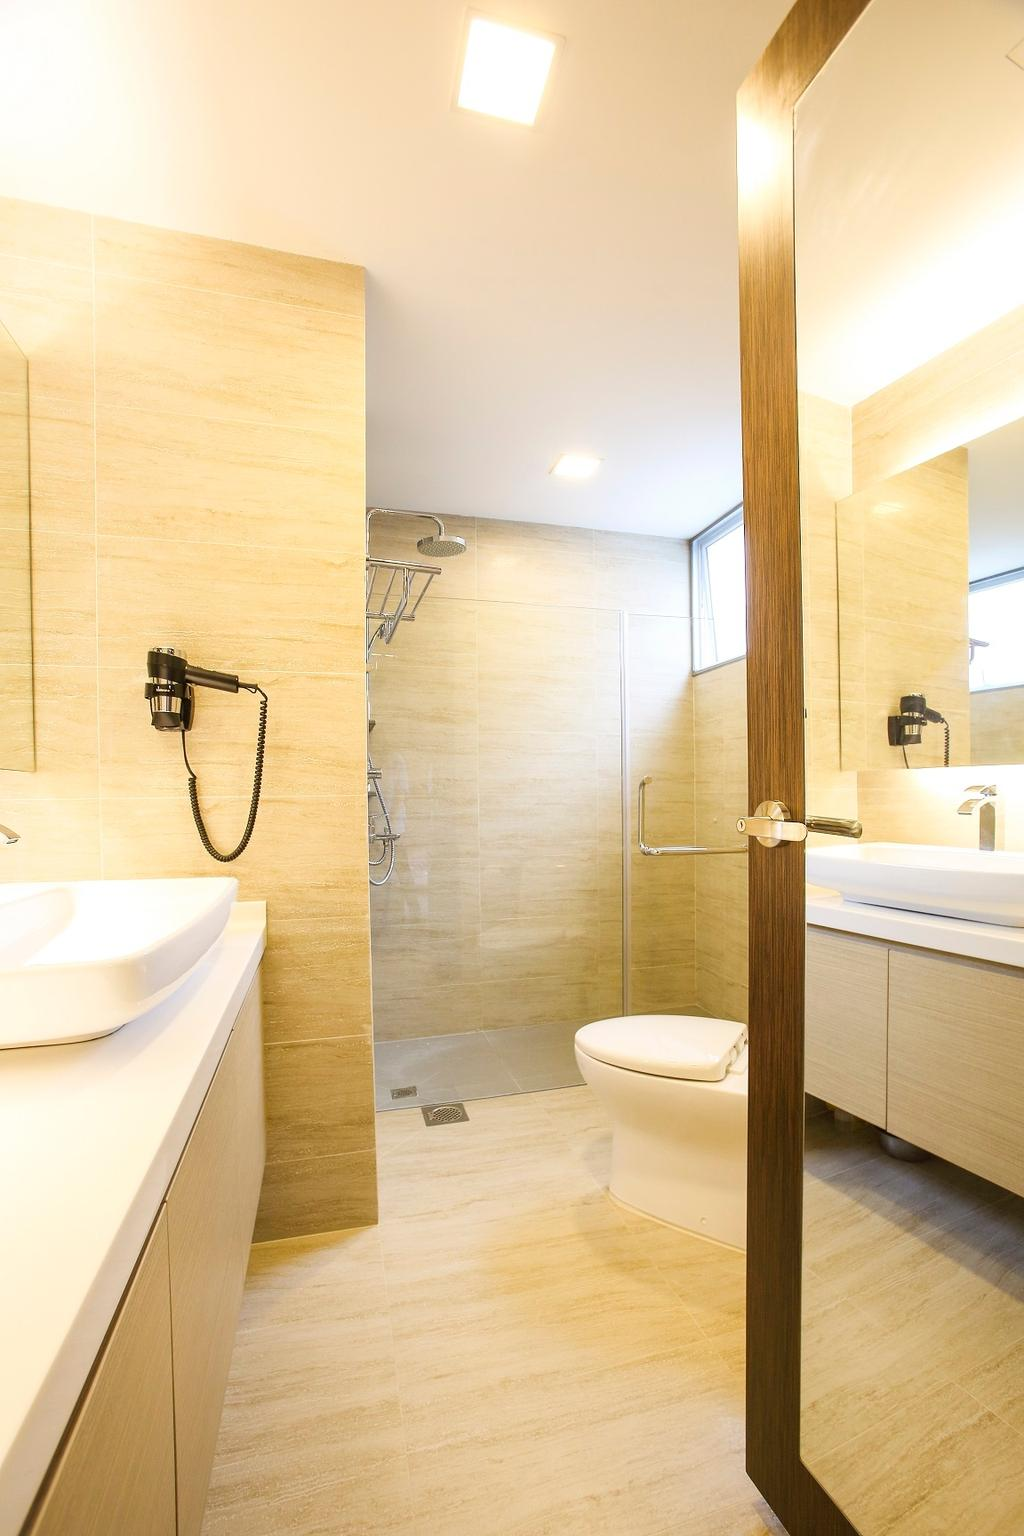 Contemporary, Condo, Bathroom, Flora Road, Interior Designer, Beaux Monde, Indoors, Interior Design, Room, Sink, Toilet